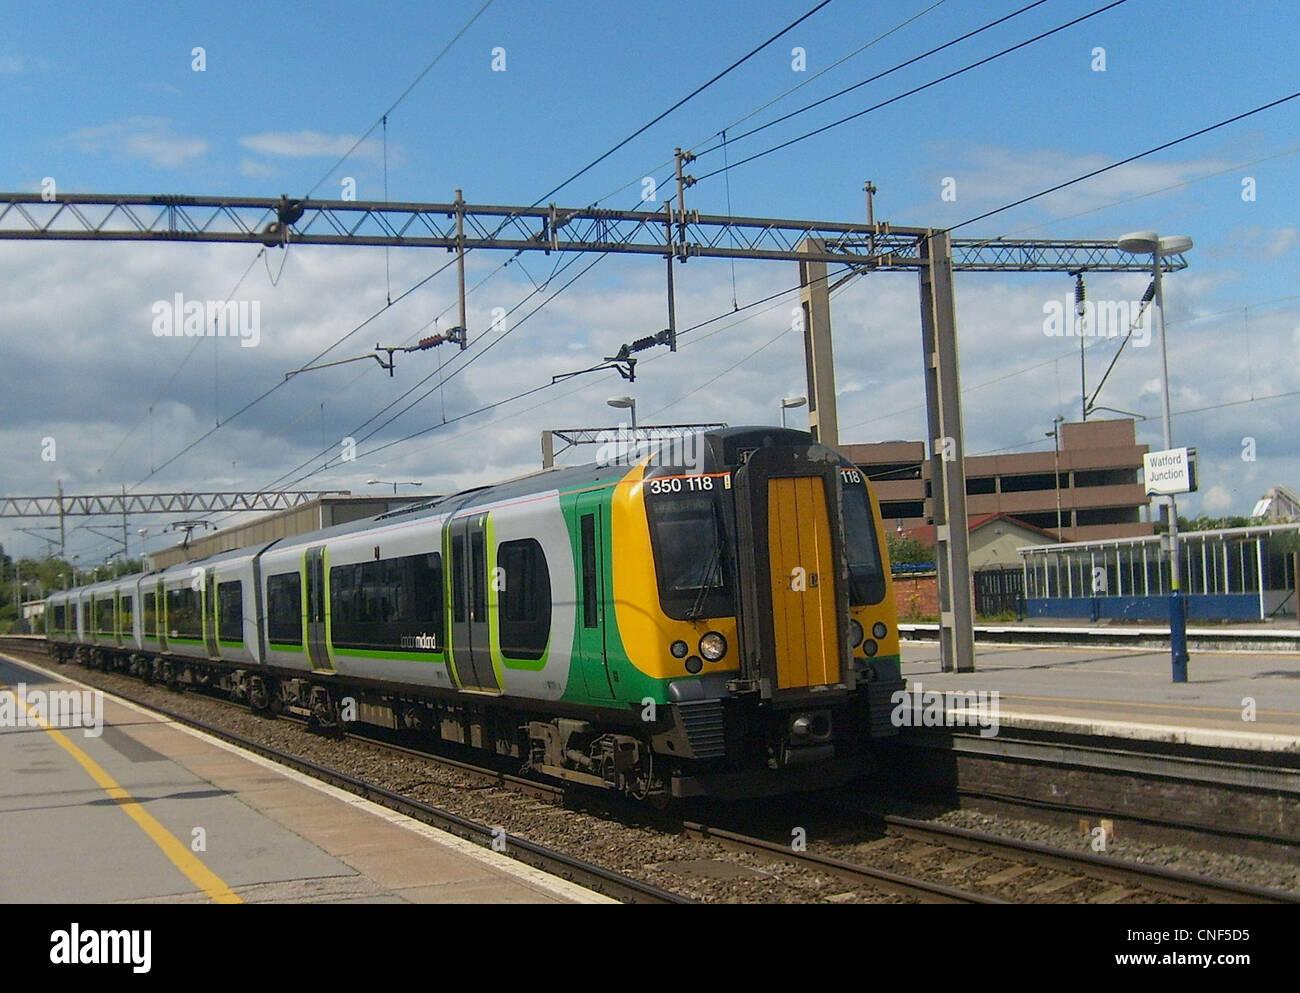 London Midland Class 350/1 Desiro No. 350118 at Watford Junction. - Stock Image